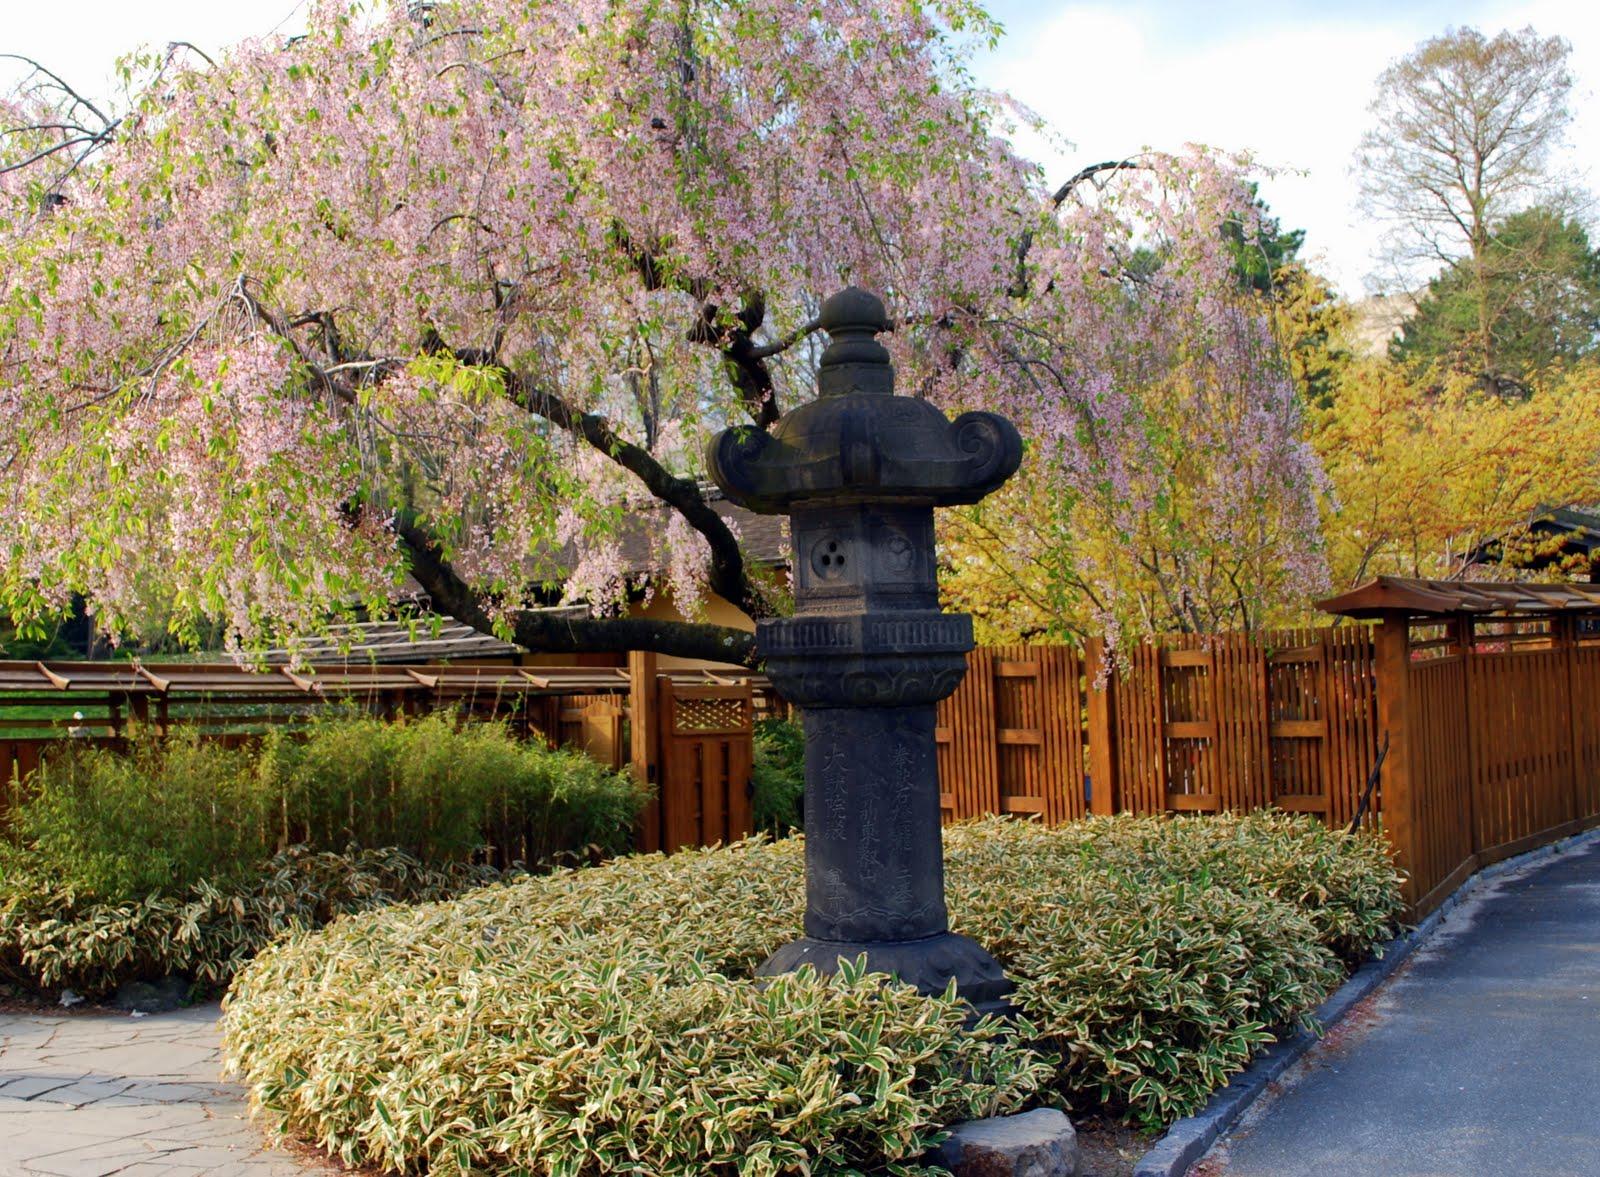 Mille Fiori Favoriti: The Brooklyn Botanic Japanese Hill and Pond Garden